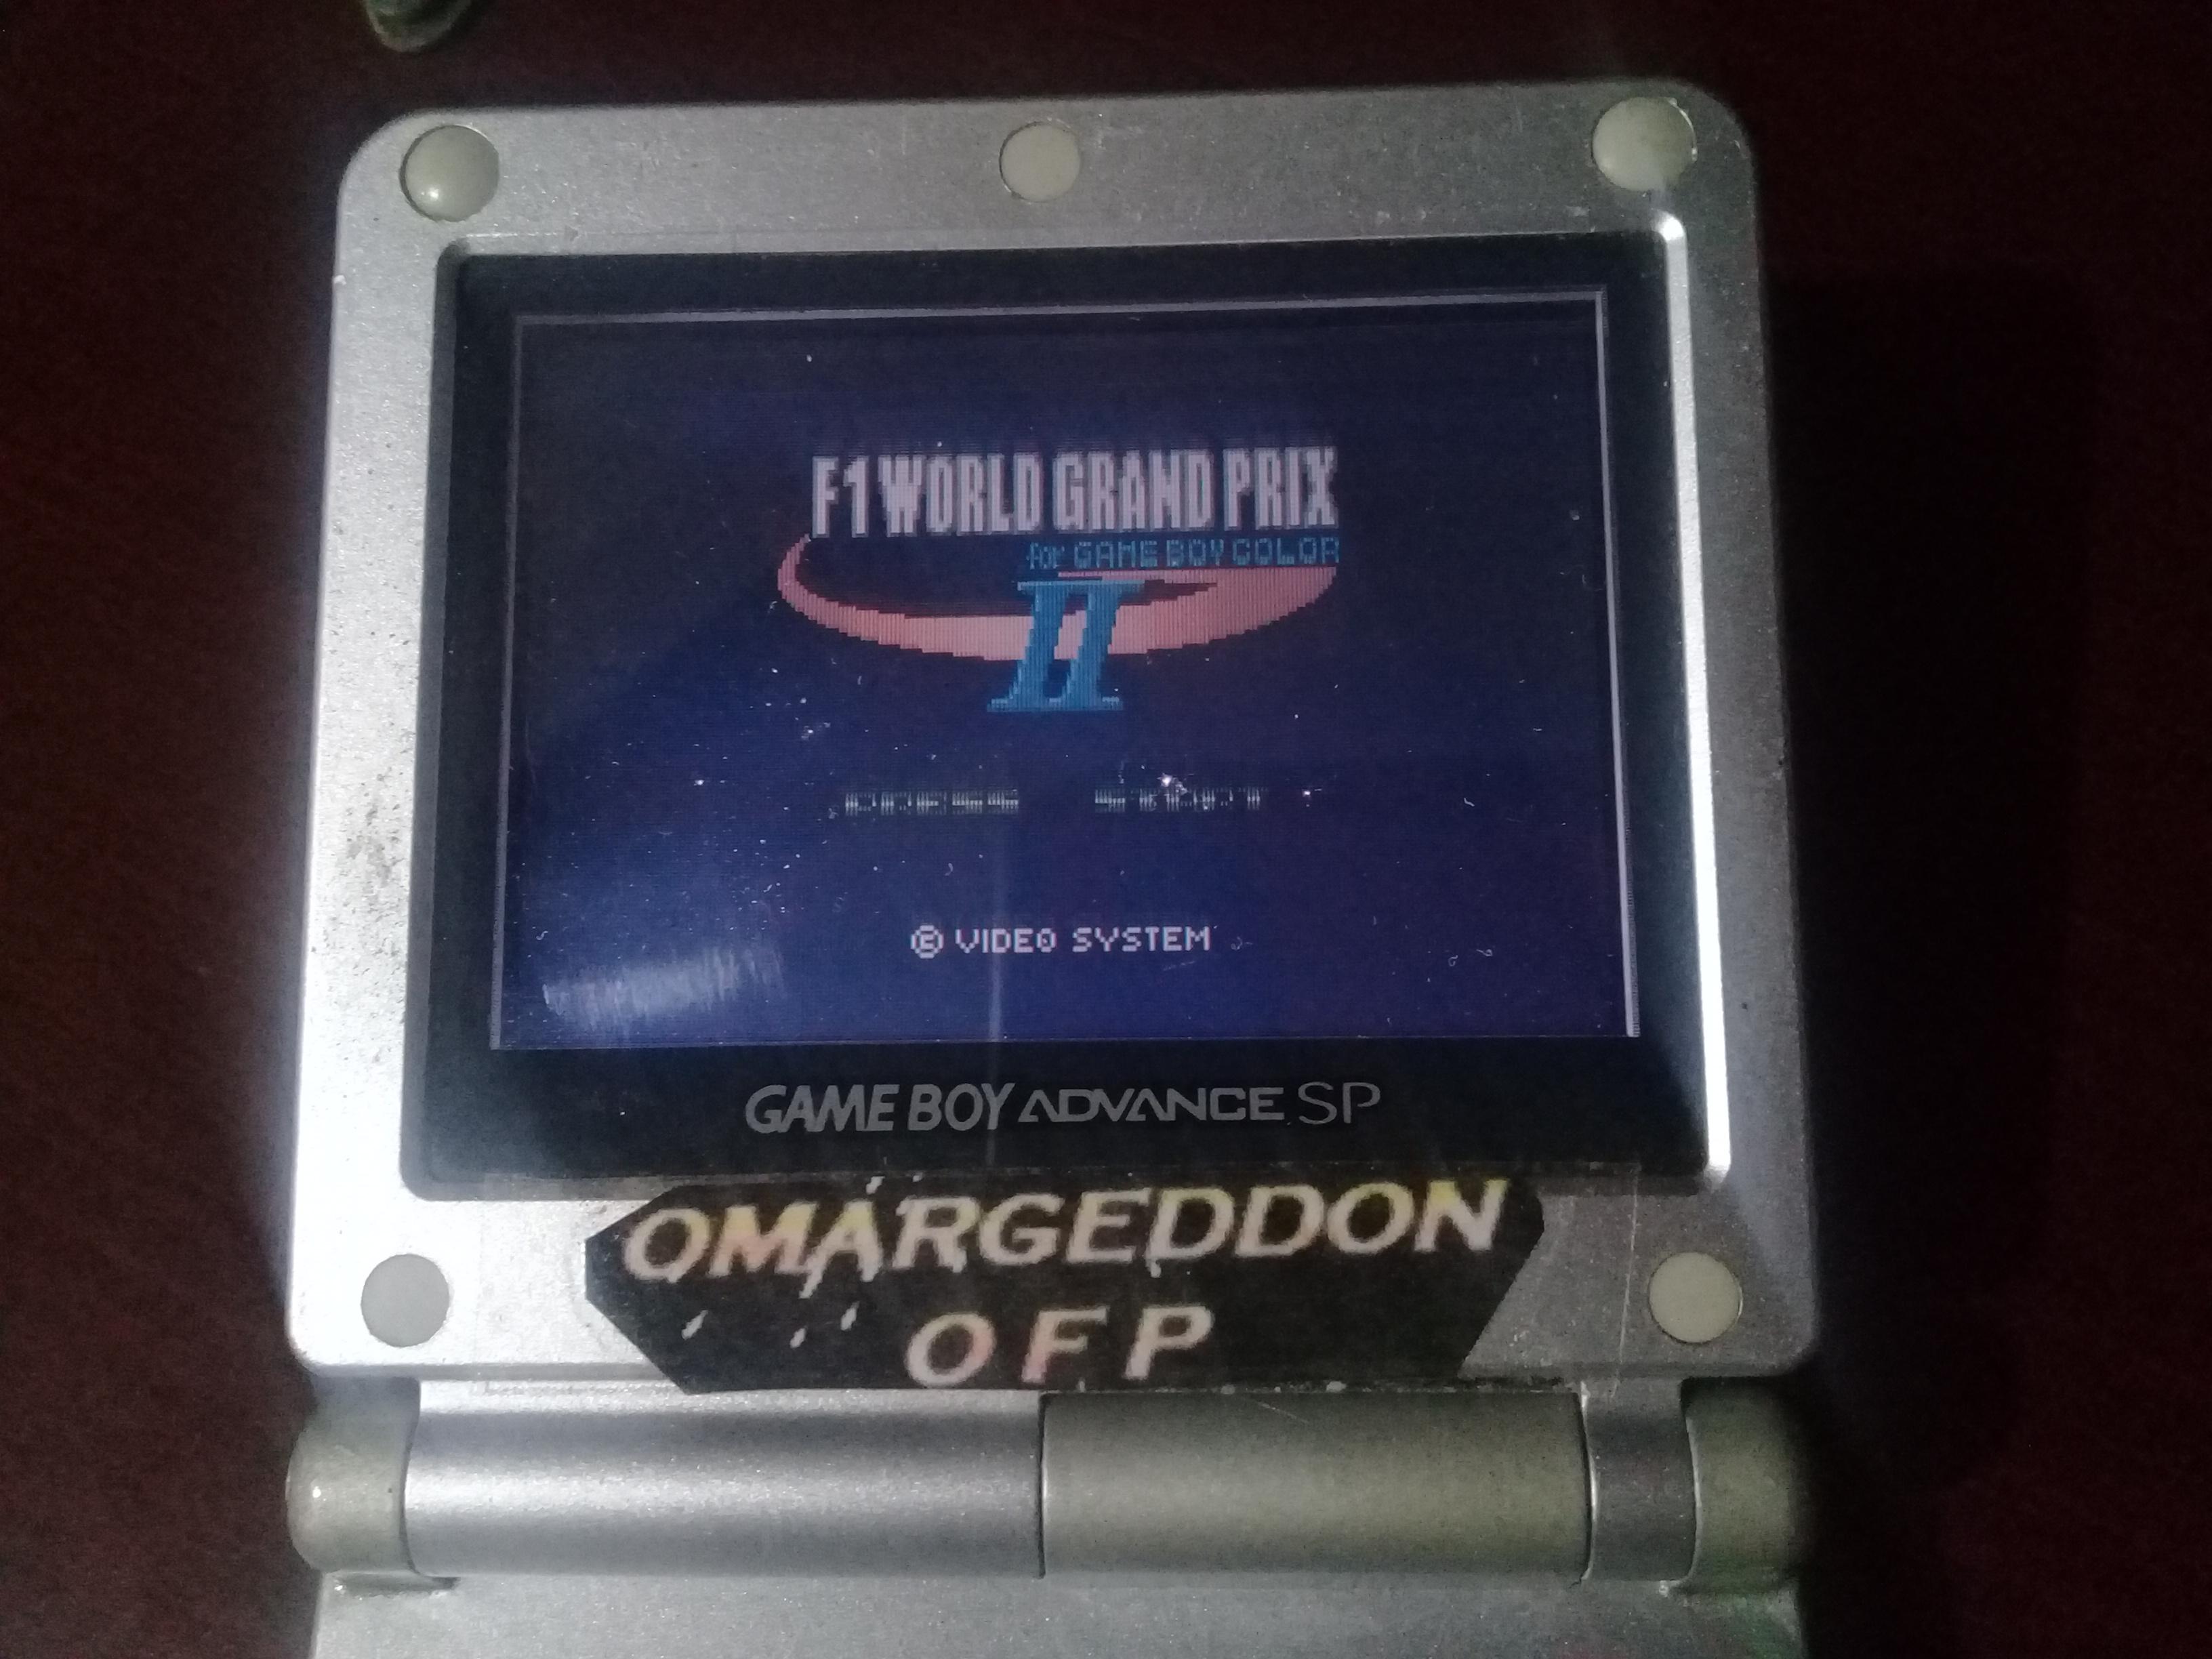 omargeddon: F-1 World Grand Prix II: Time Trials: Rookie: Track 08 British GP [Best Lap] (Game Boy Color) 0:01:15.1 points on 2019-01-02 12:47:29